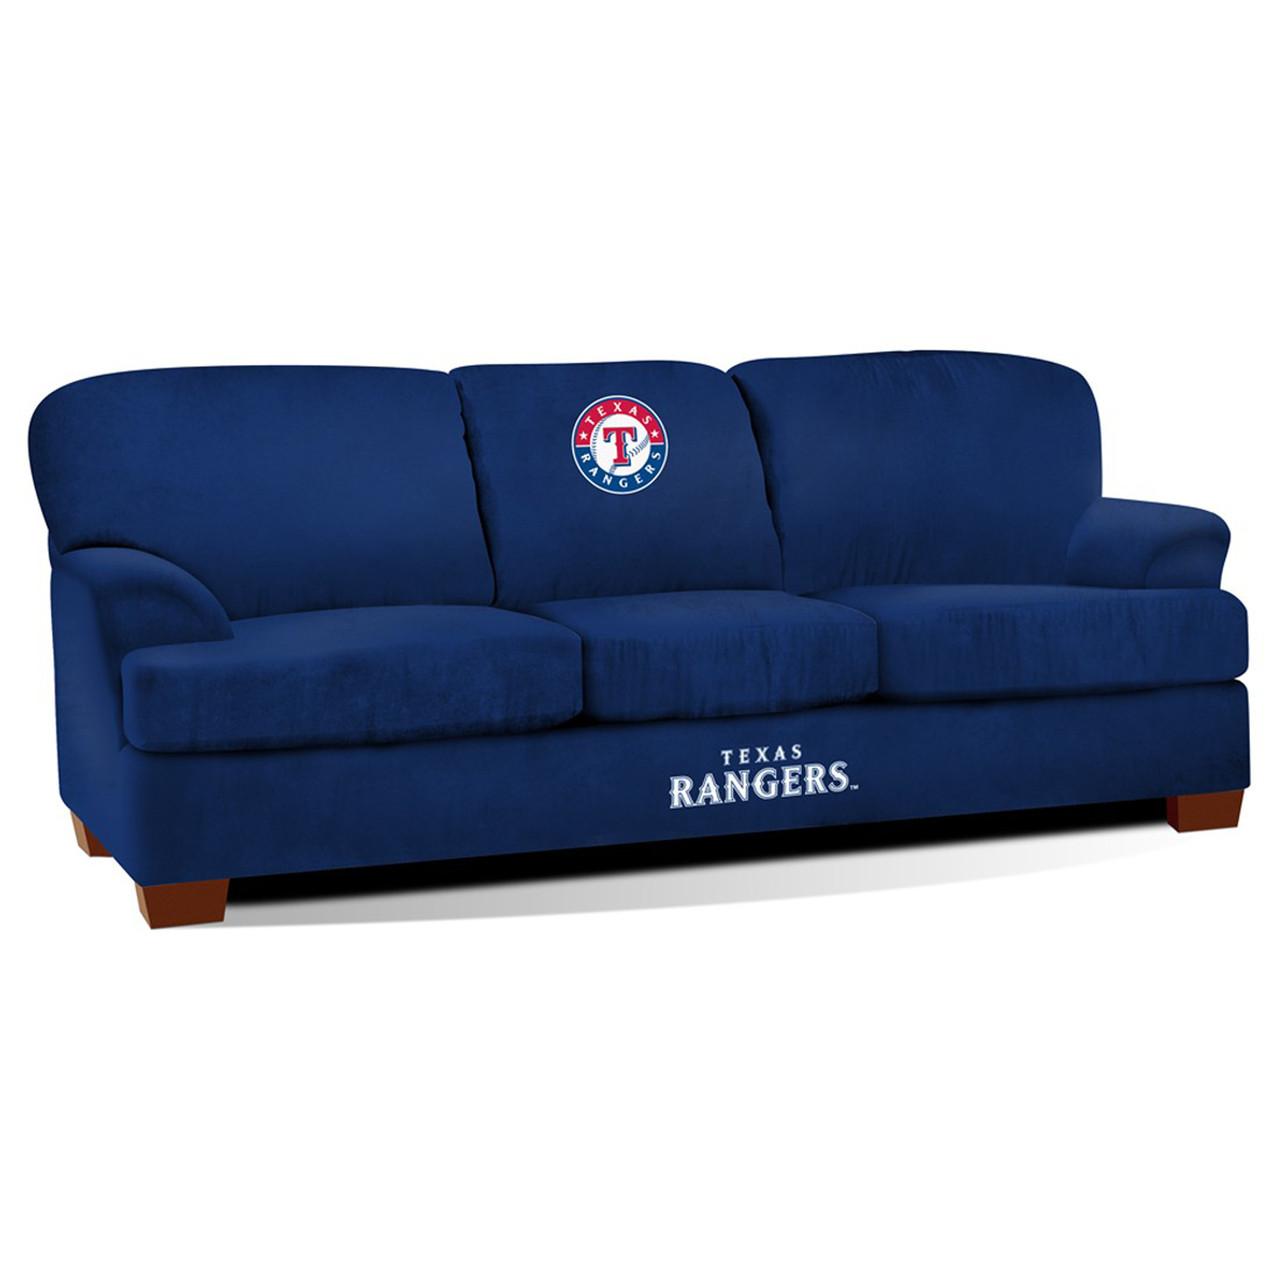 Texas Rangers Blue Microfiber Sofa